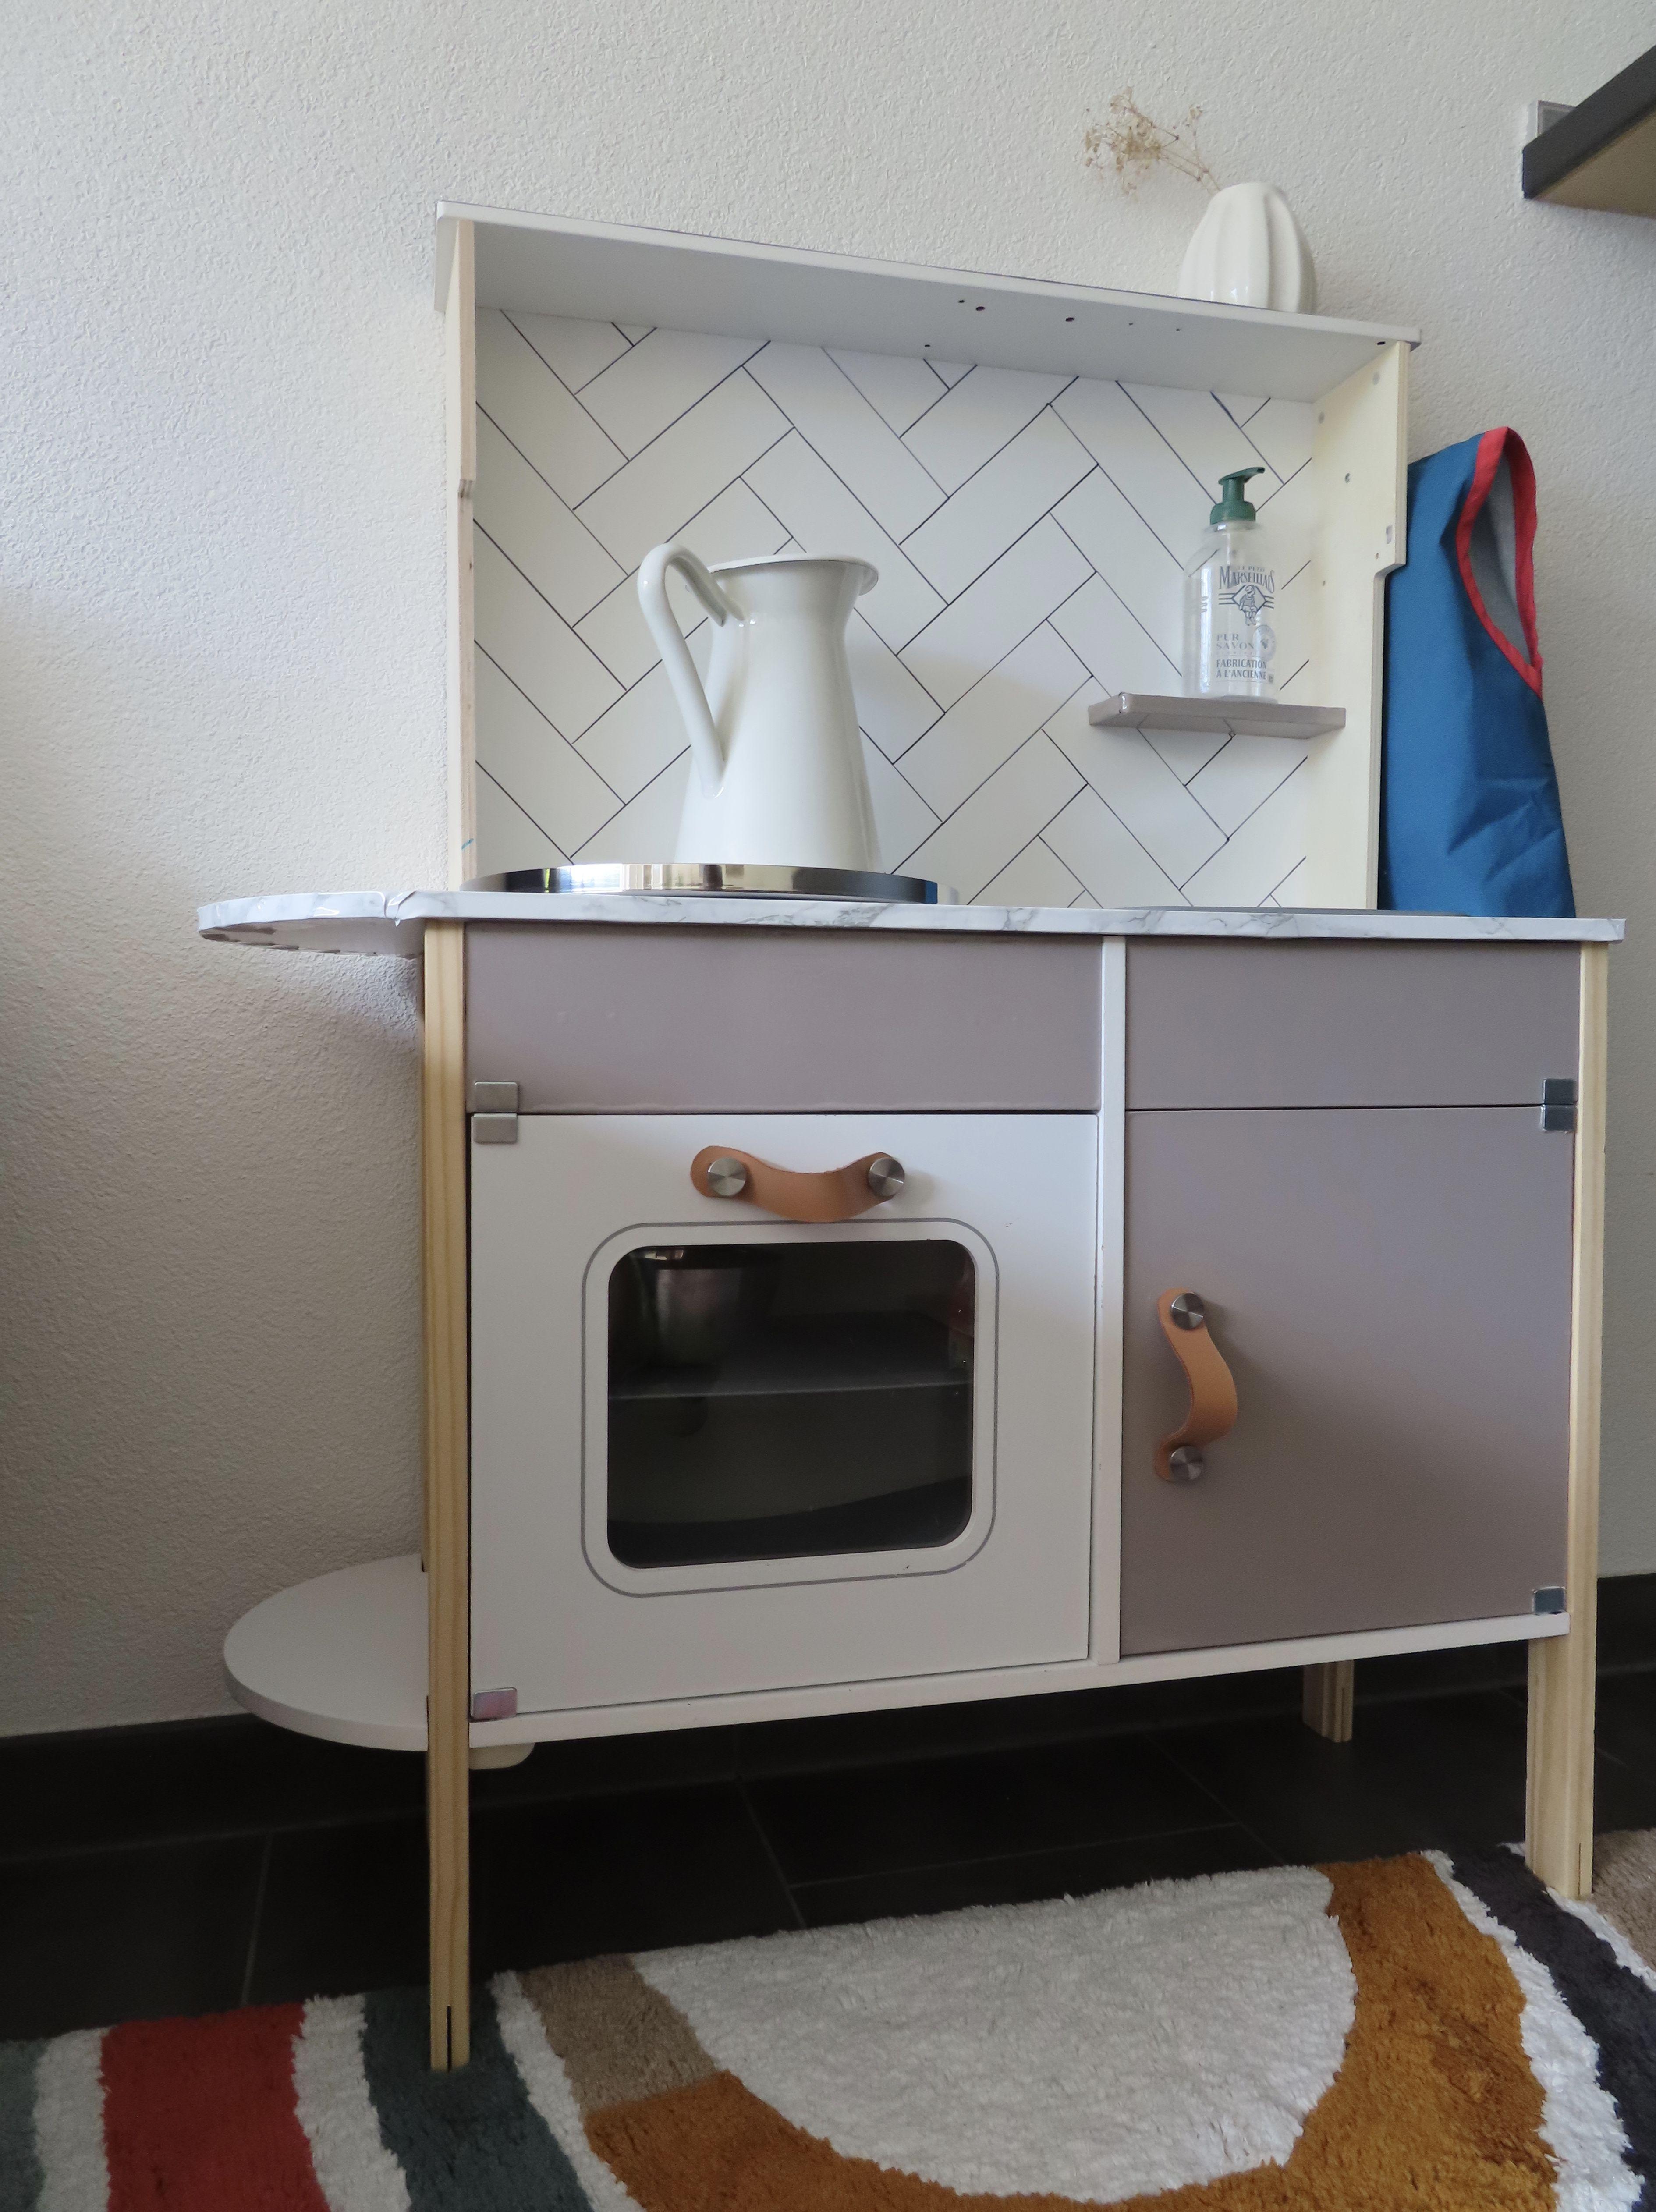 Epingle Sur Toddler Kitchen